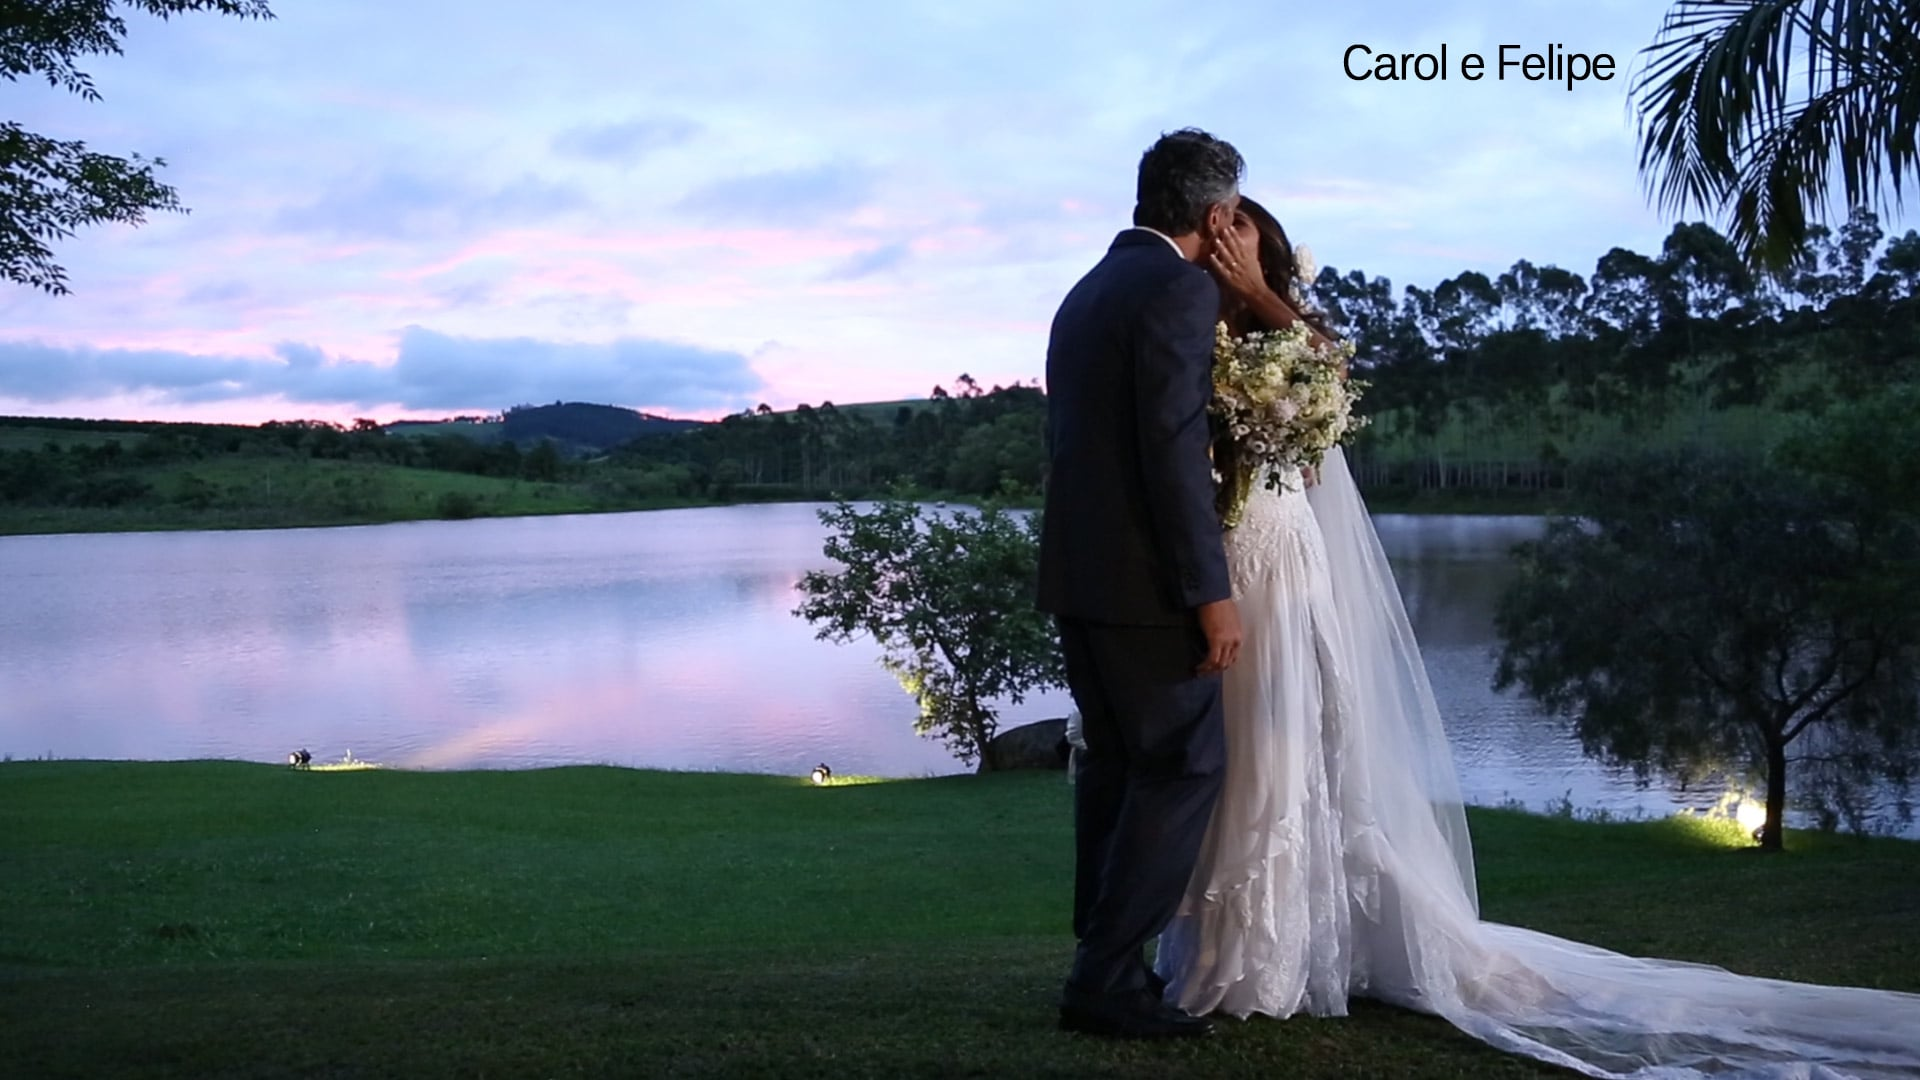 Carol e Felipe